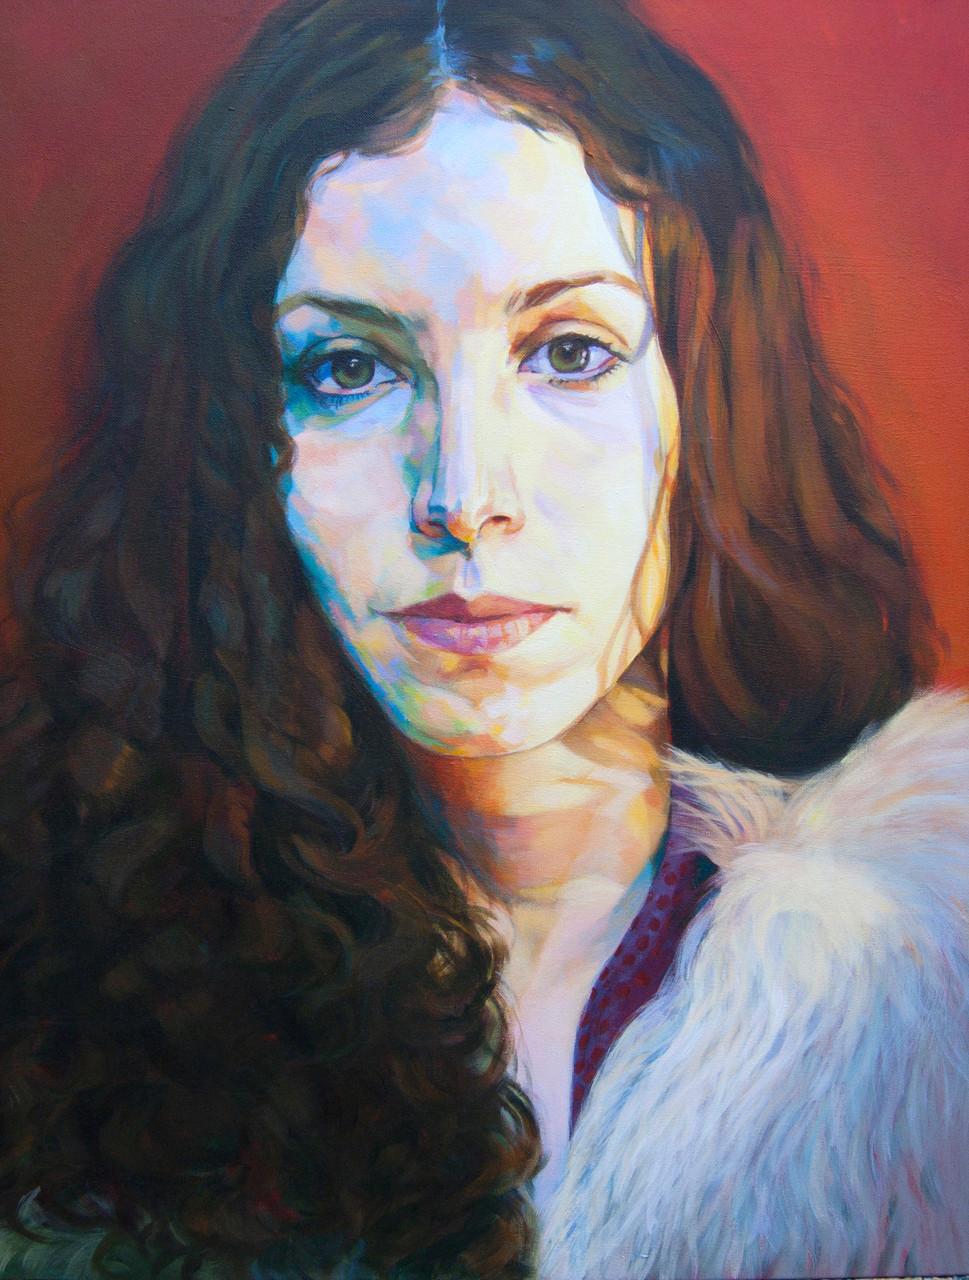 Nerea. Acrylic on canvas.